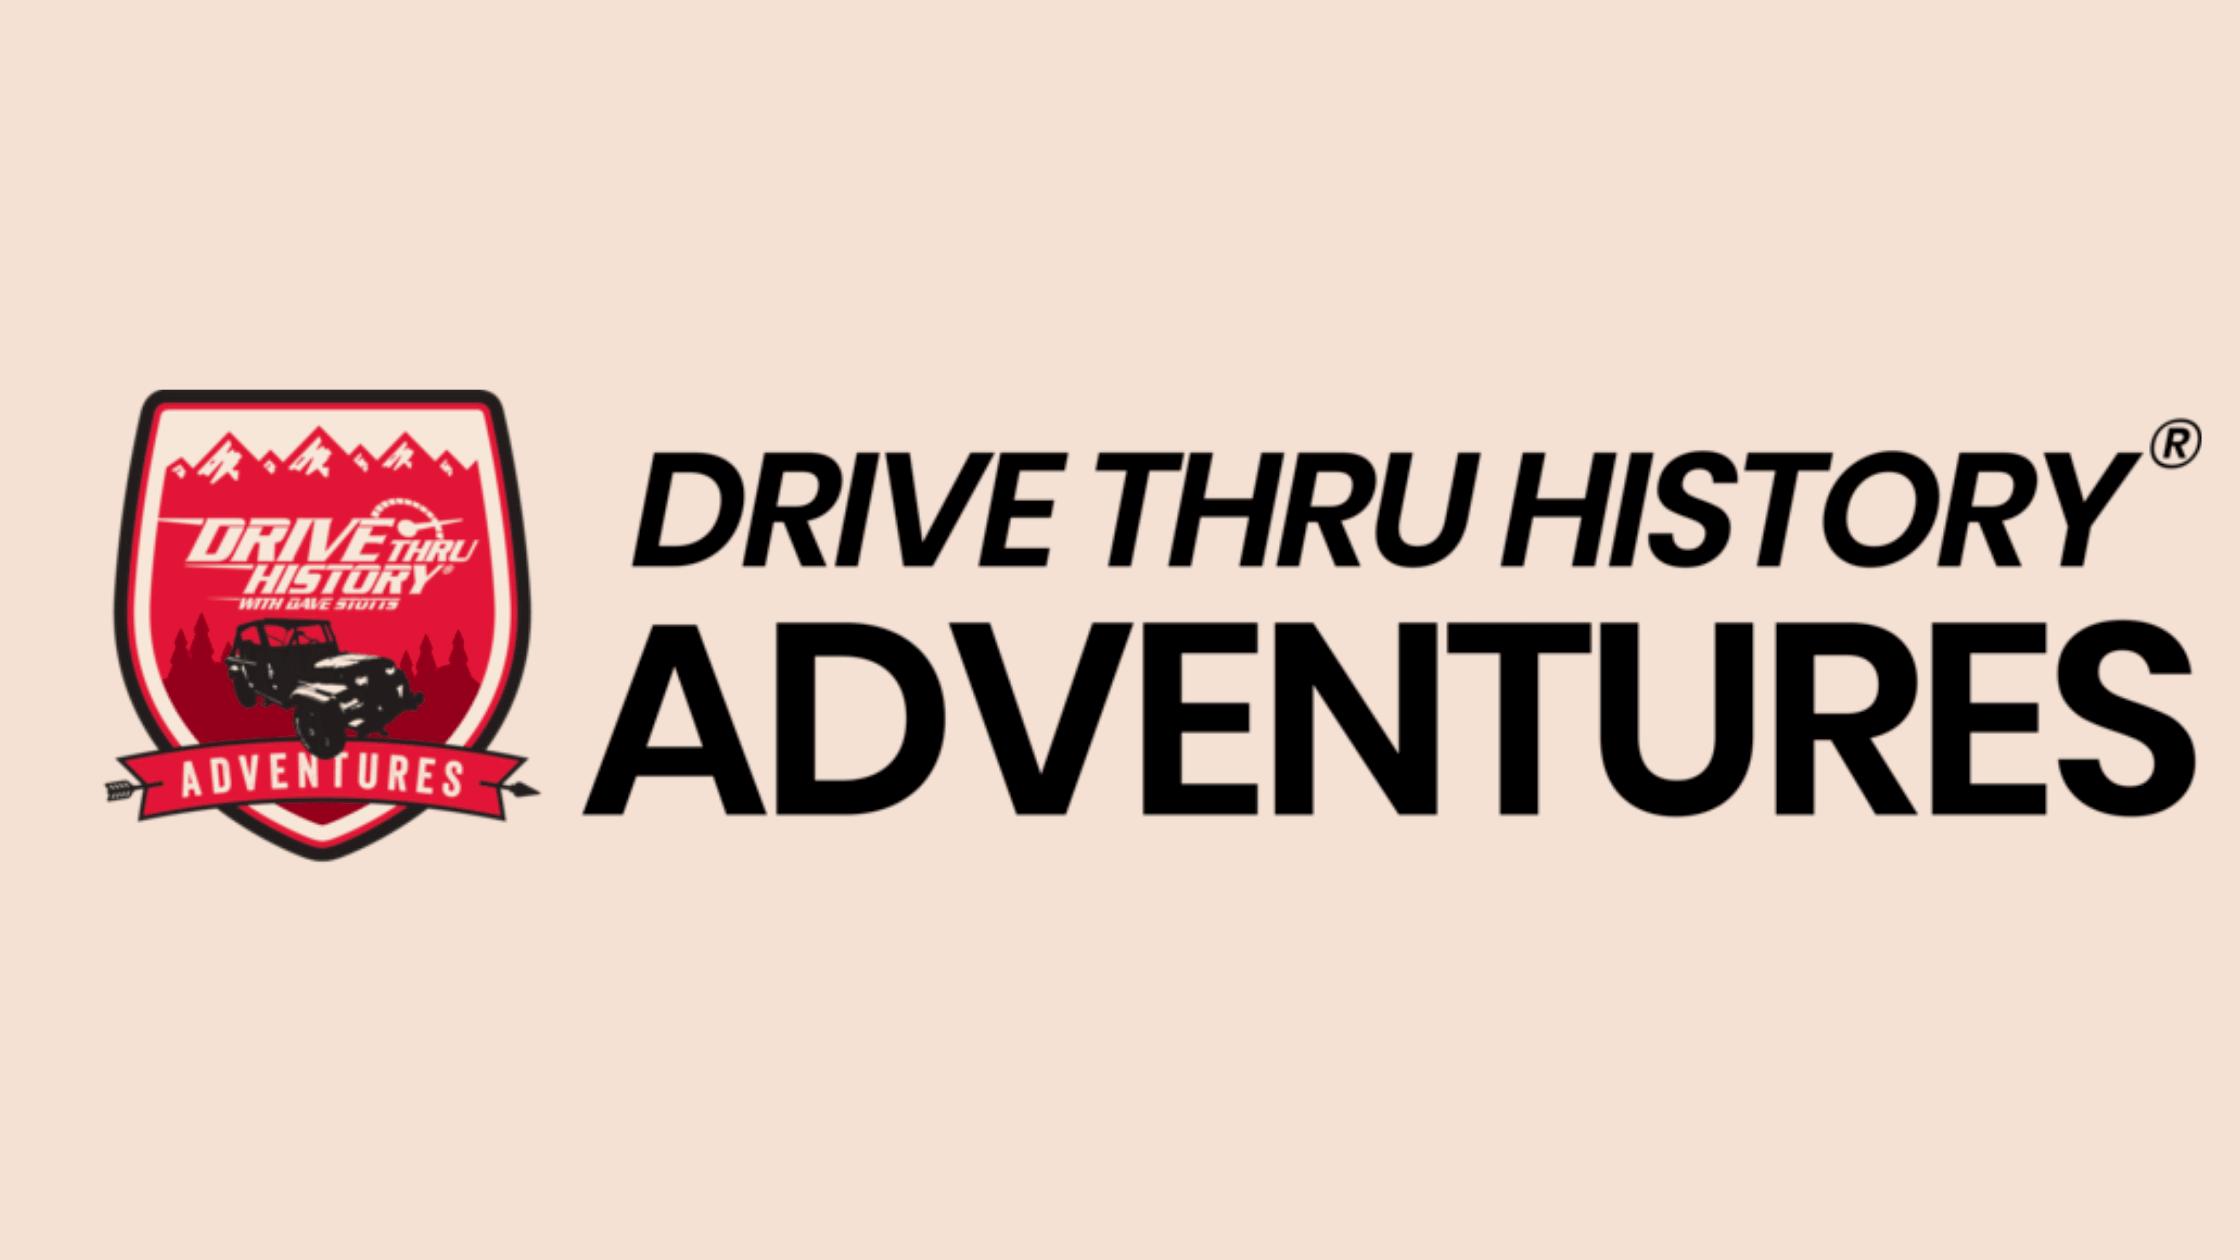 drive through history